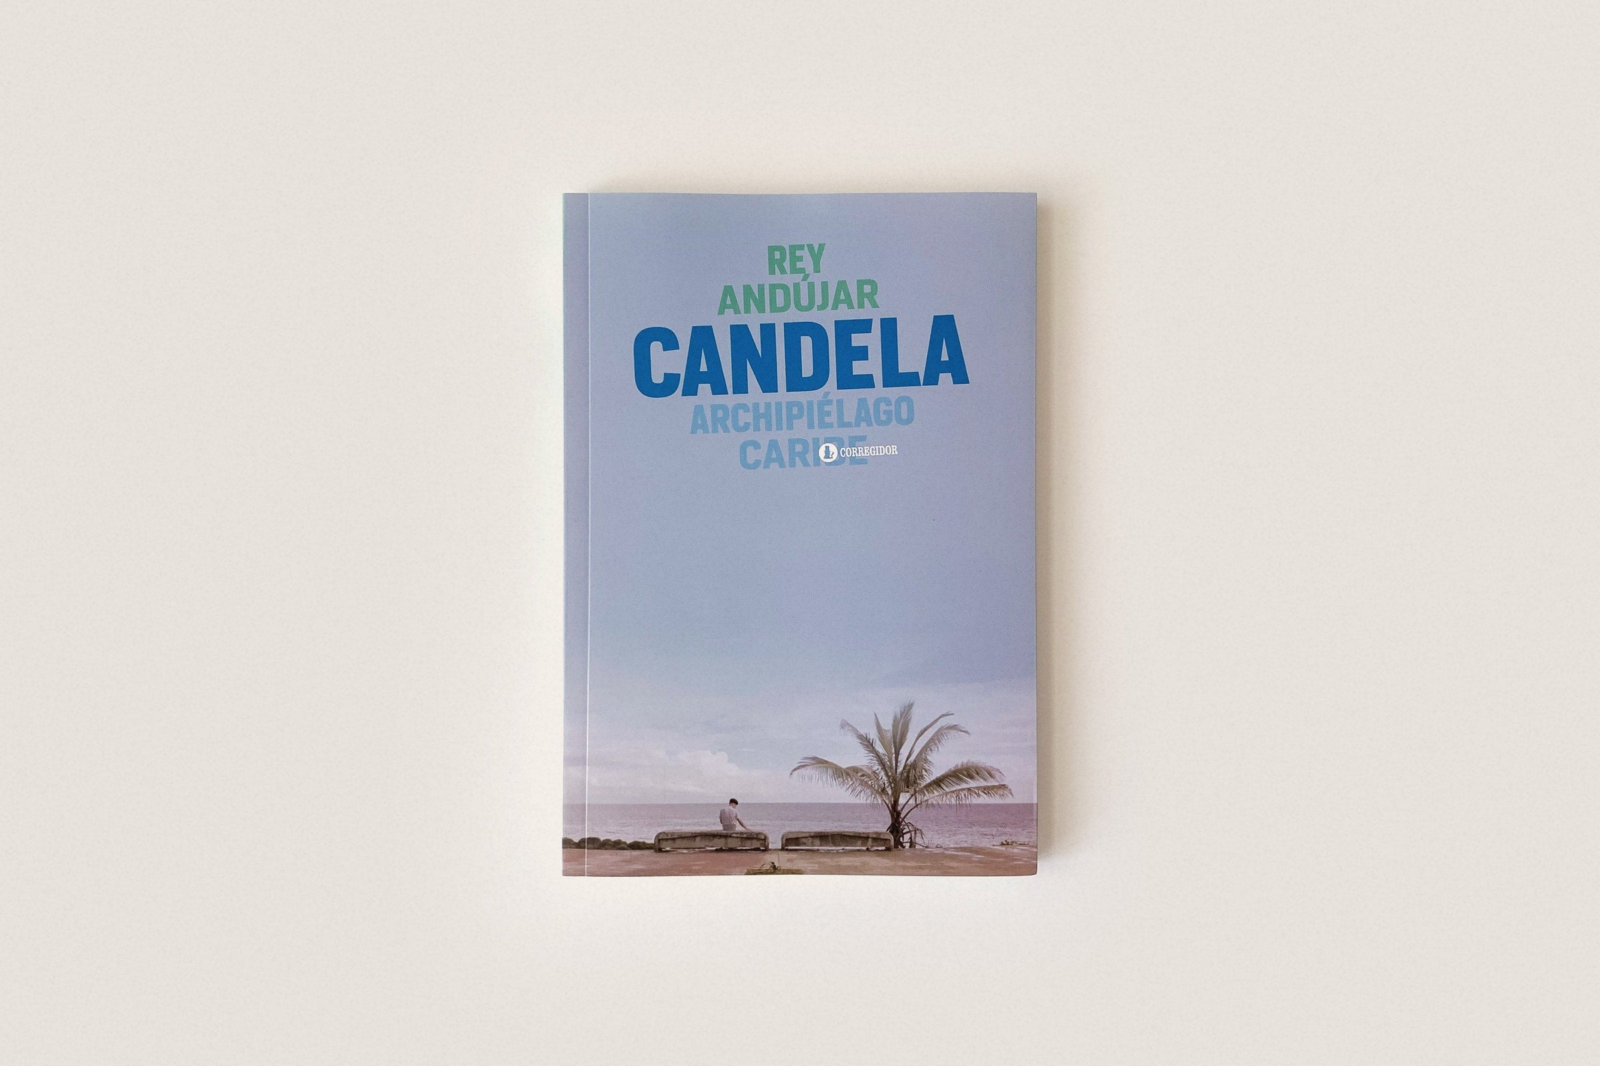 Libro: Candela — Rey Andújar